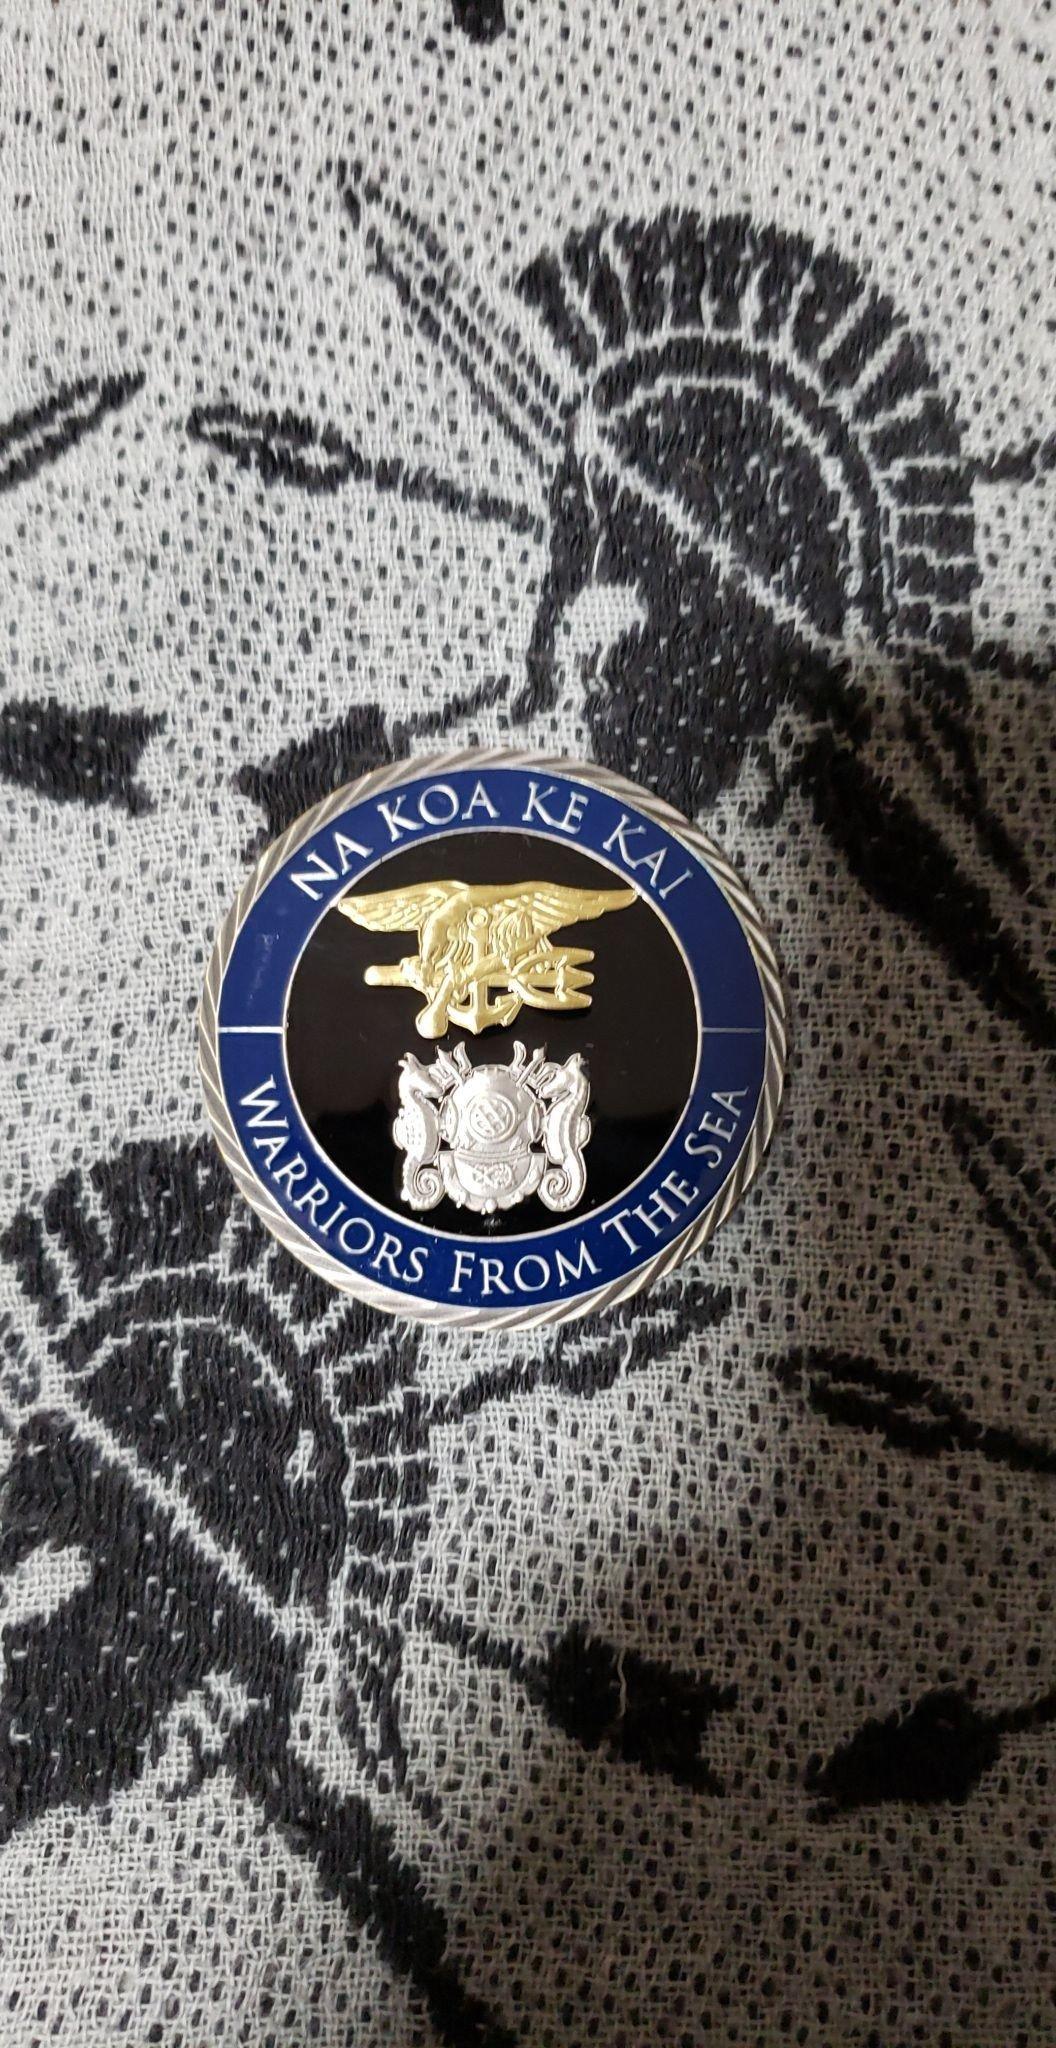 Authentic Rare Seal Delivery Vehicle Team One SDVT-1 Na Koa Ke Kai round seal team challenge coin back